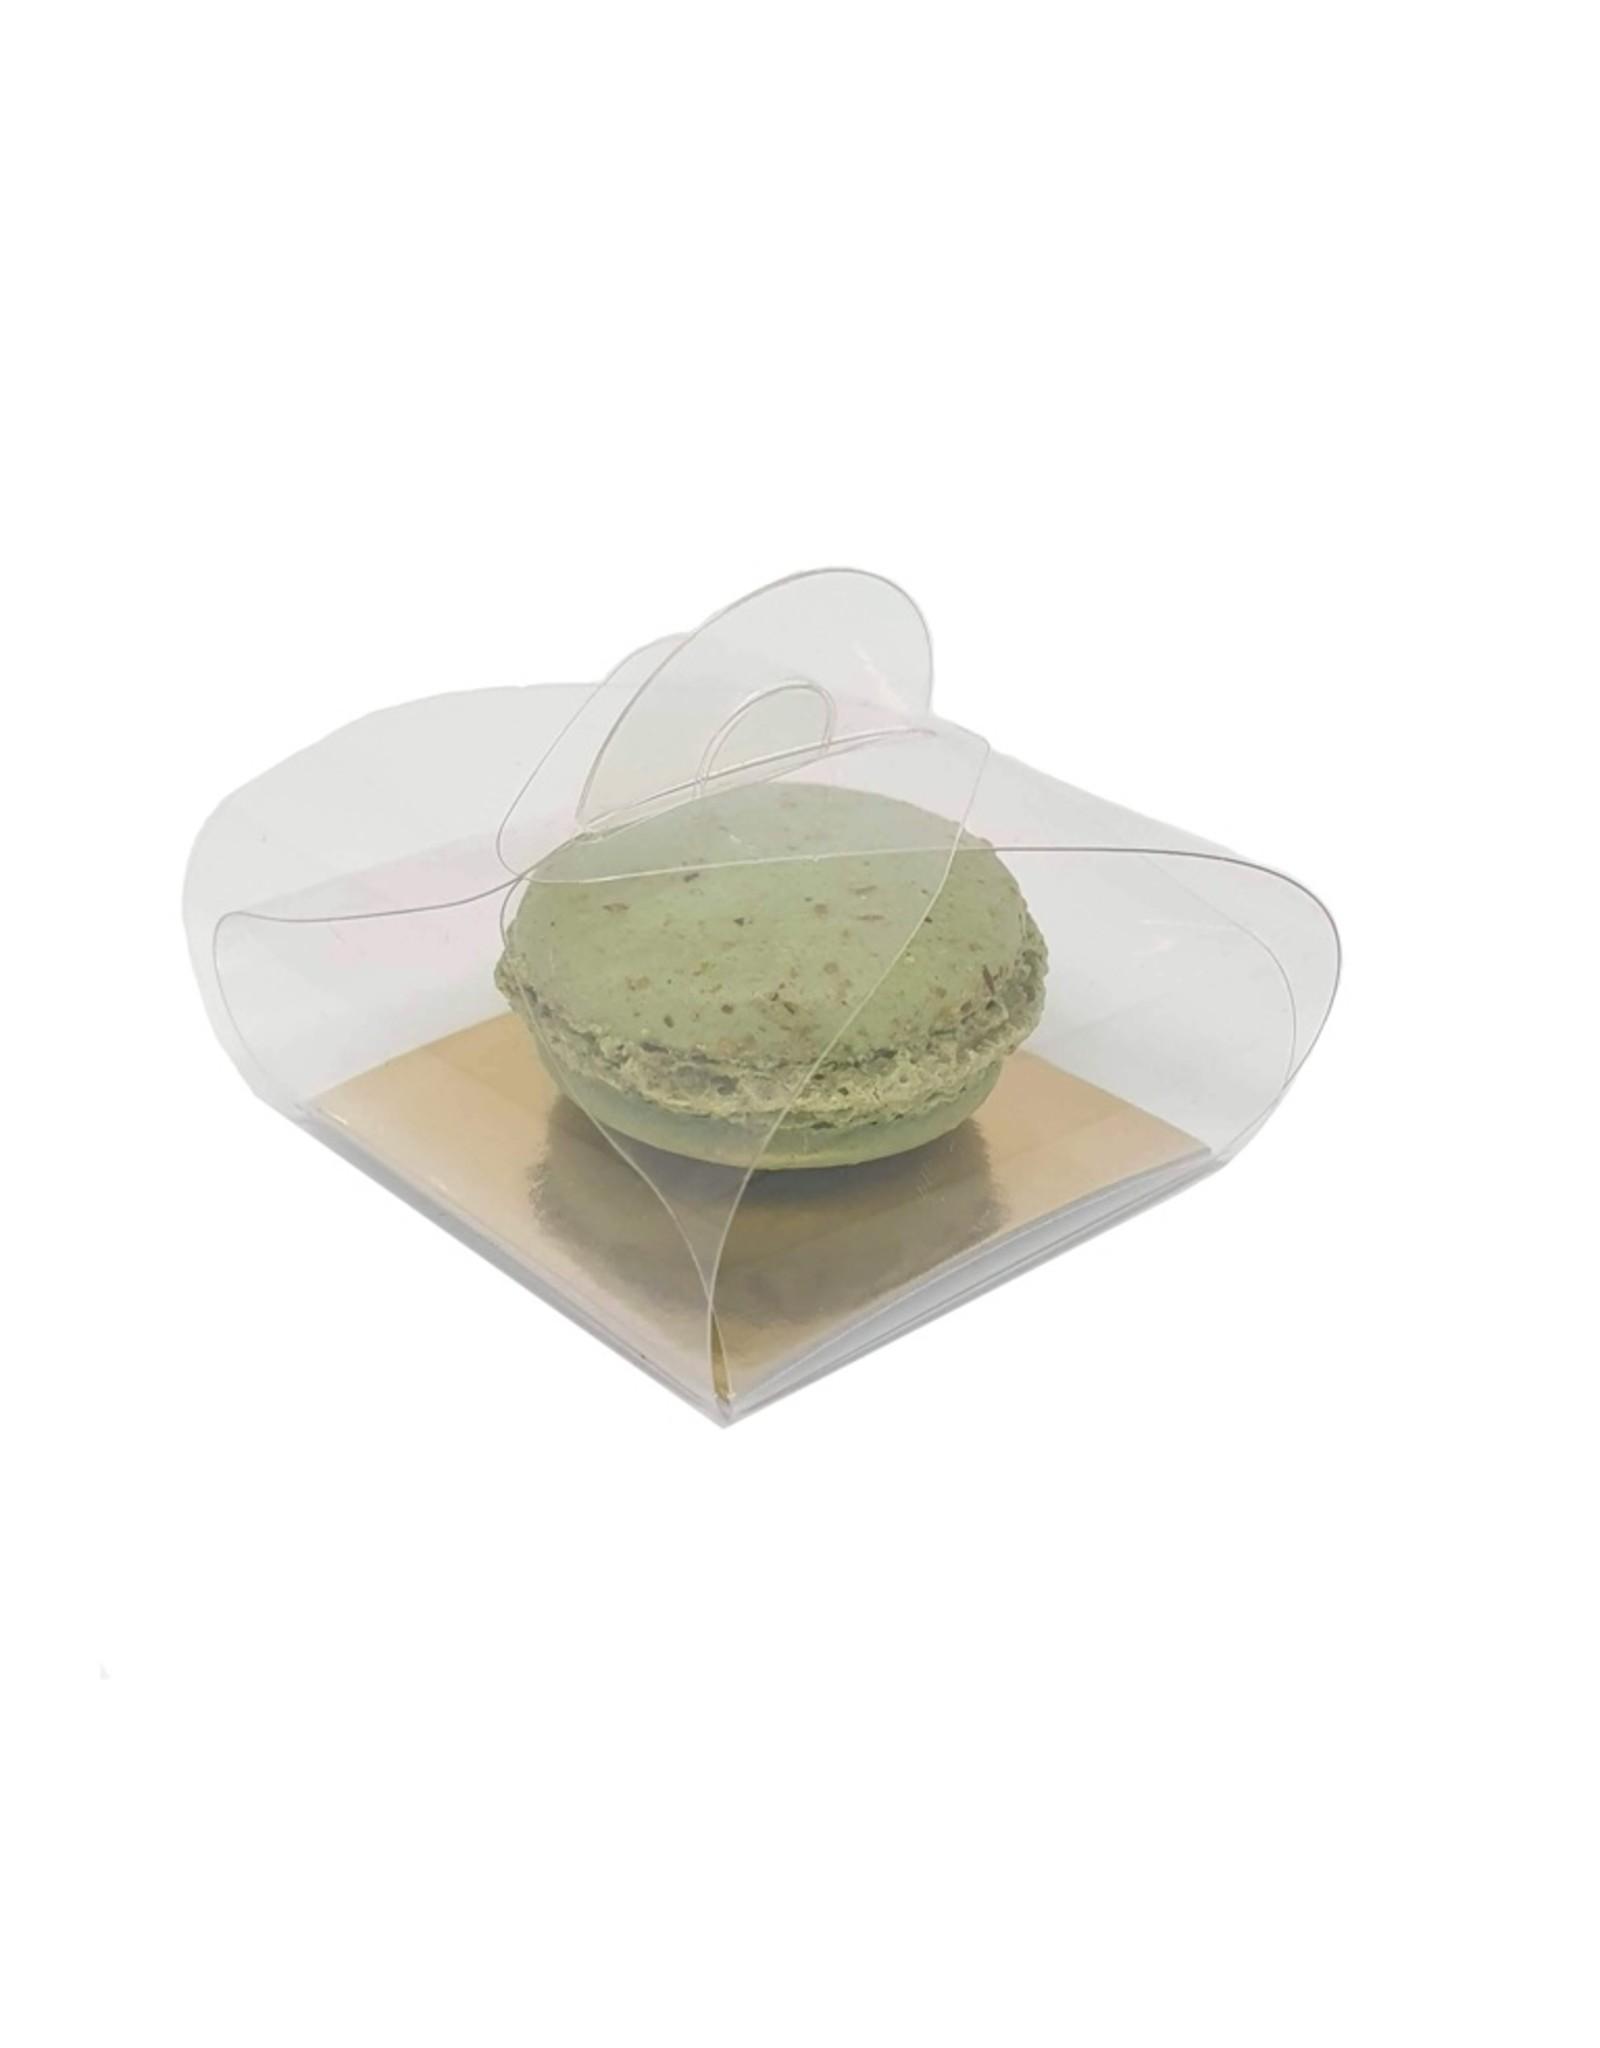 Clear bundle for 1 macaron (per 100 pieces)